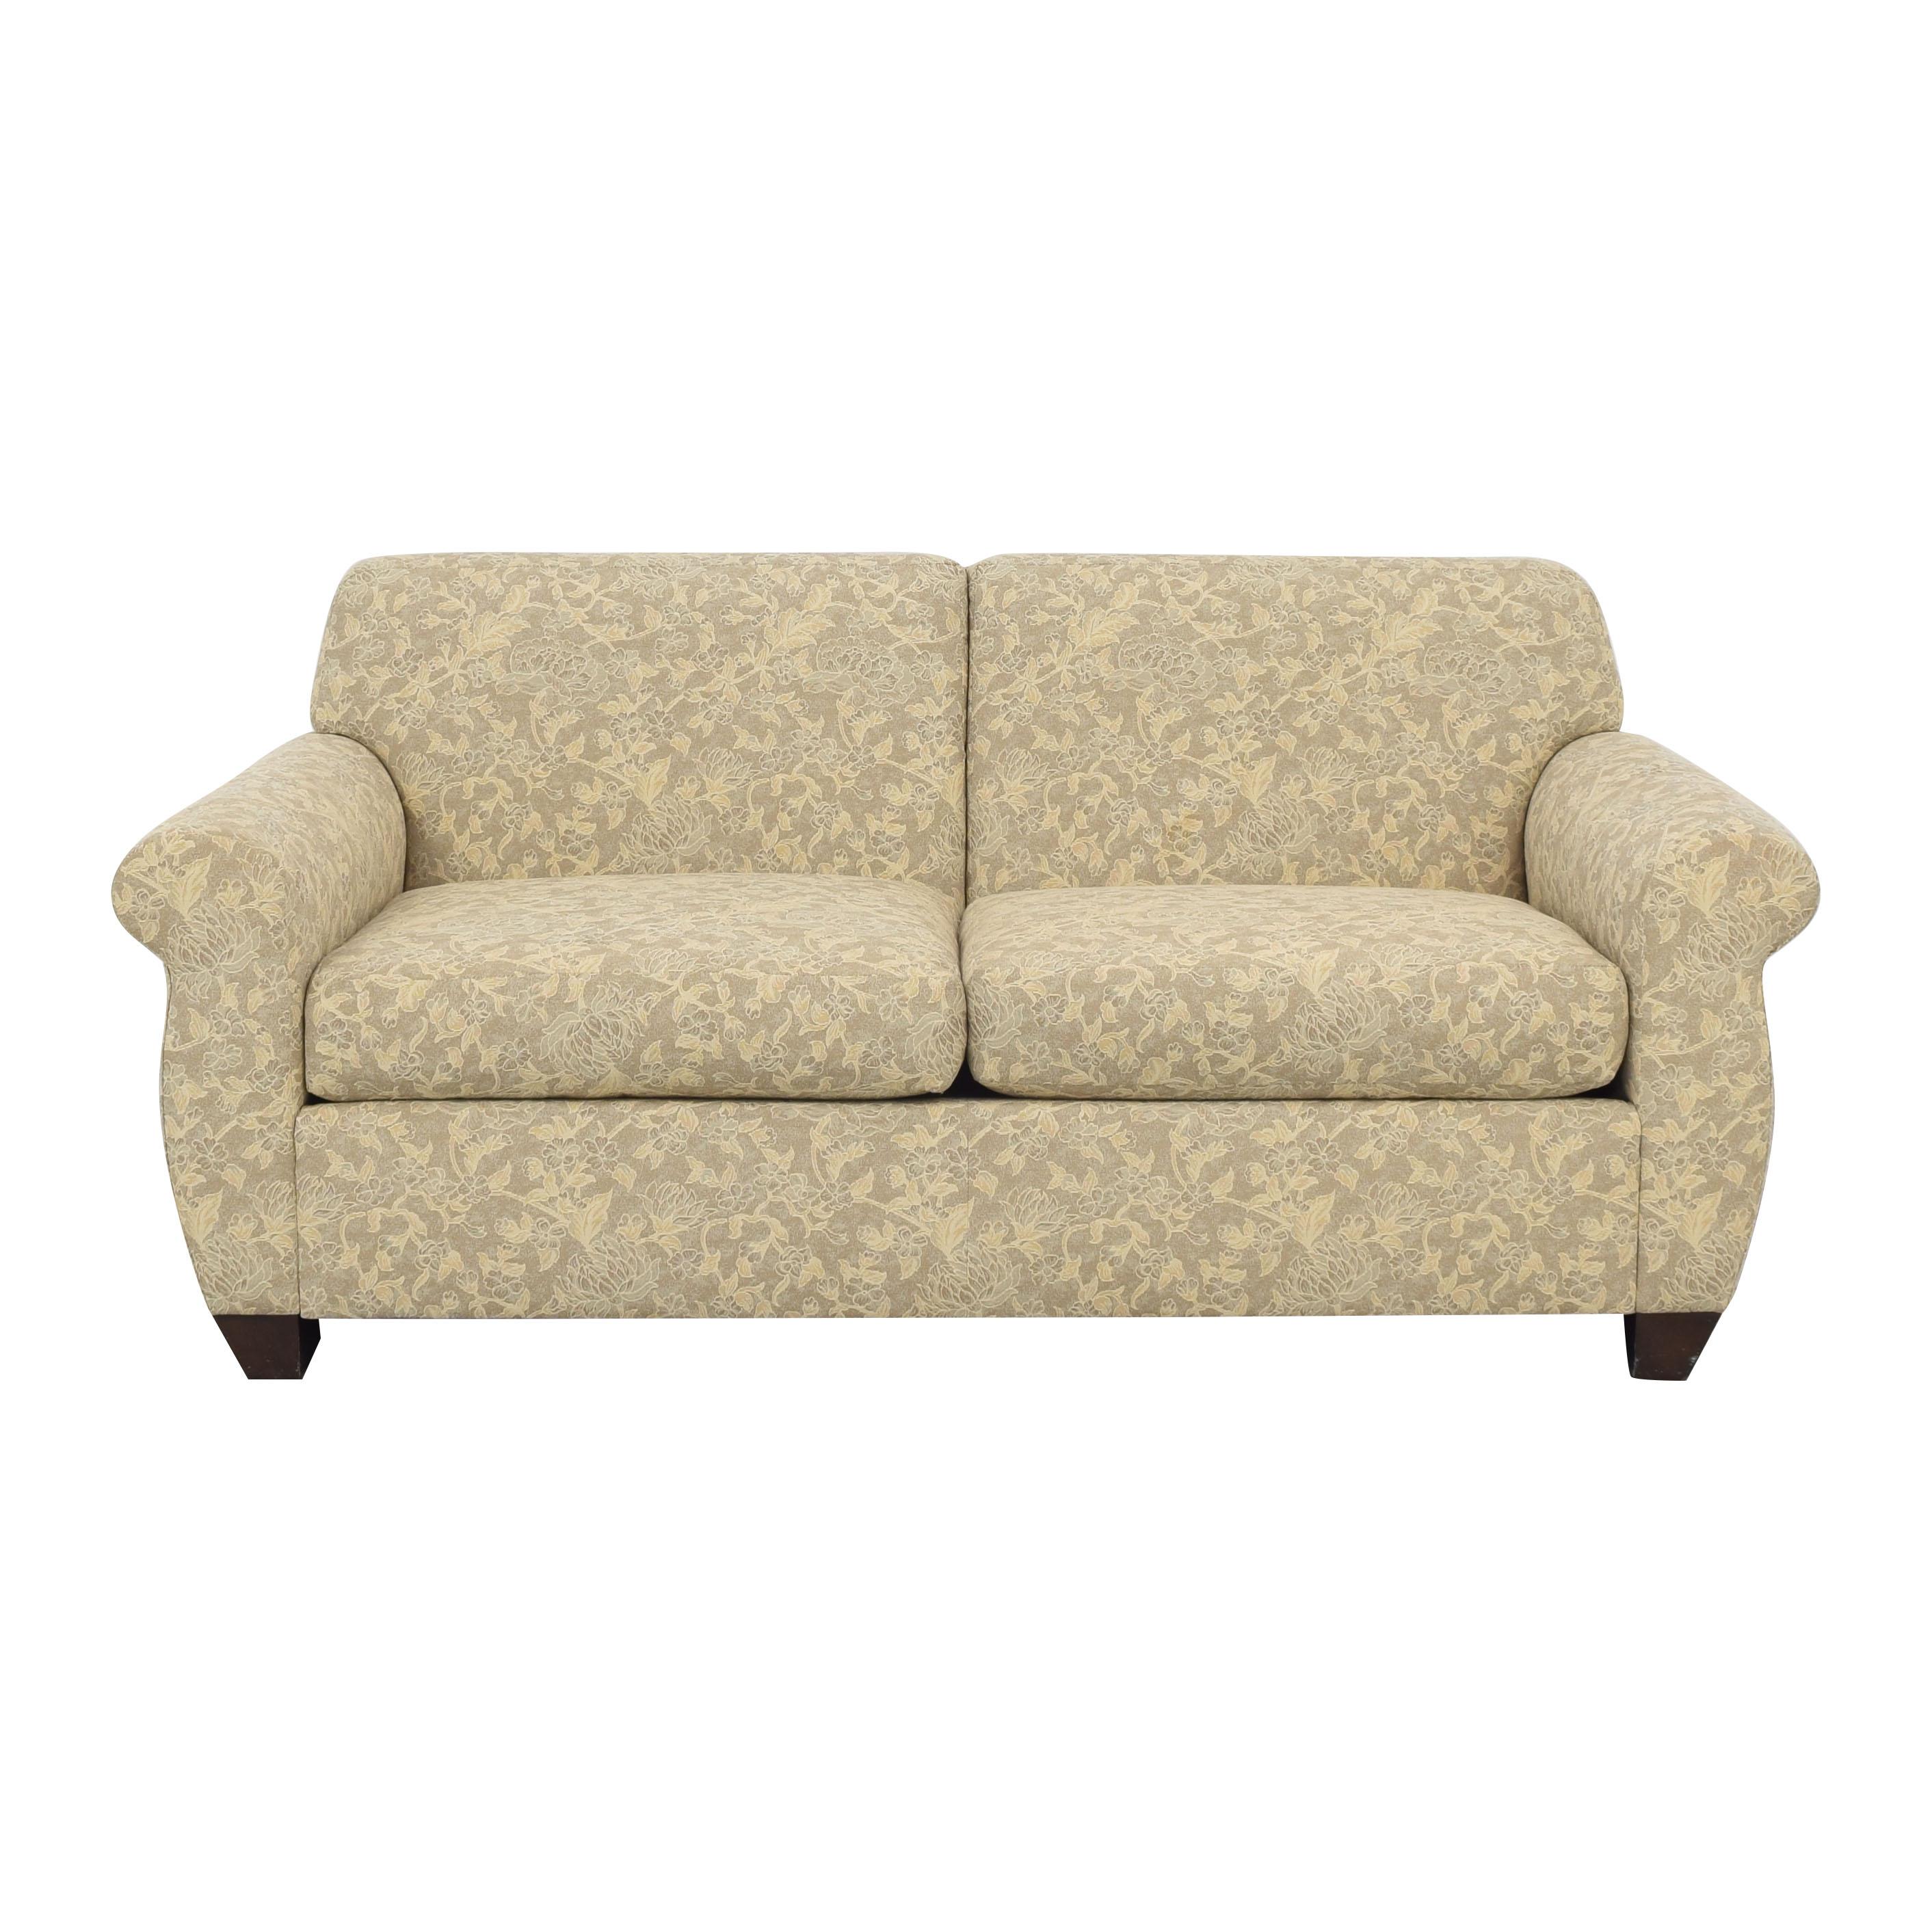 Bright Bright Chair Company Olli B Loveseat Sofas